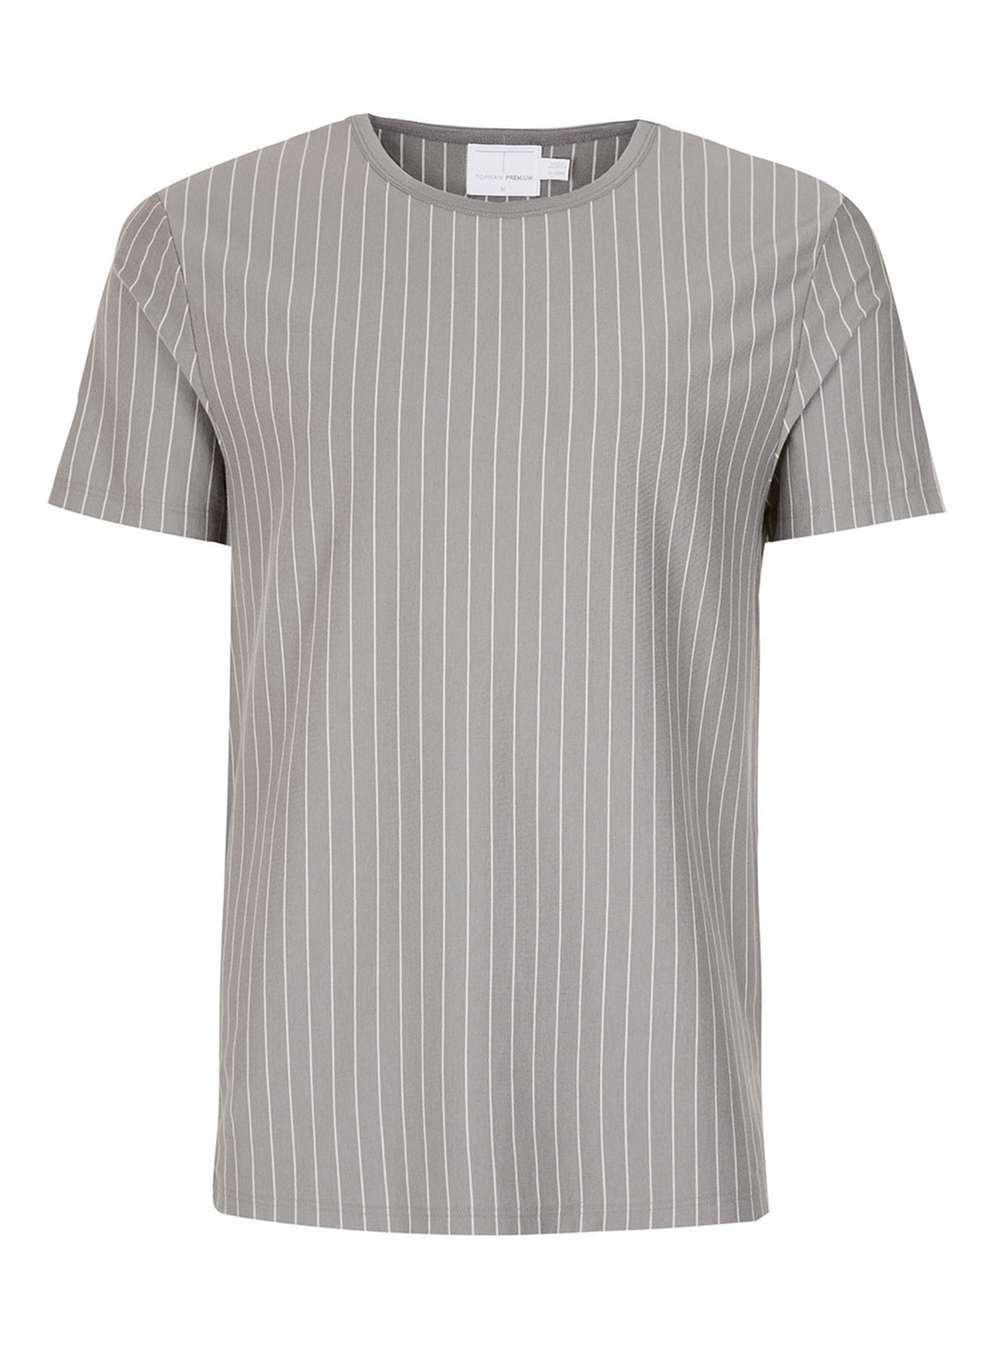 TOPMAN PREMIUM Grey Stripe T-Shirt , £25